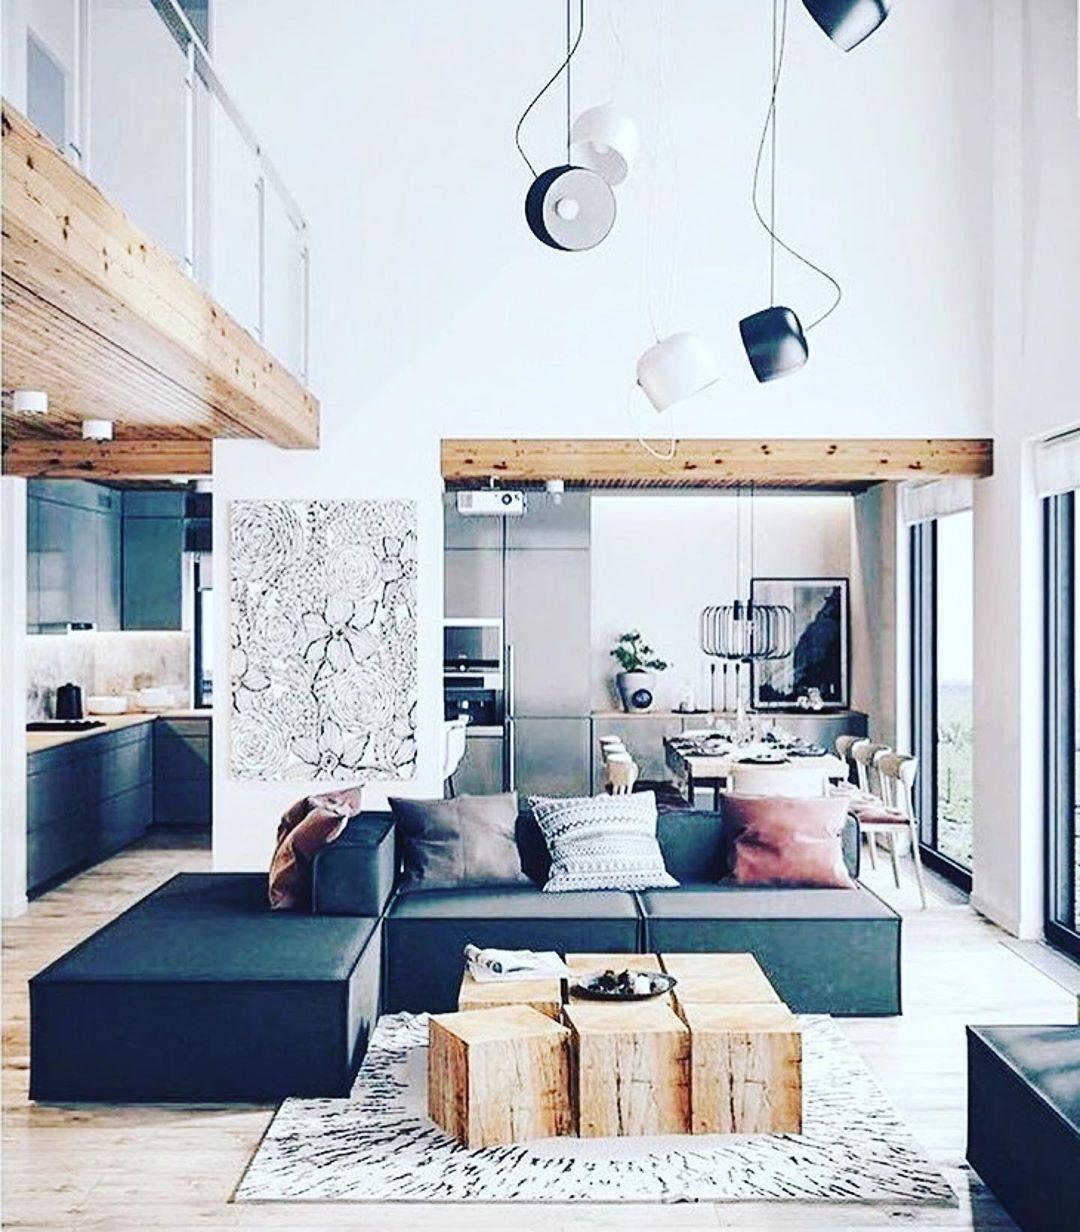 Instagram Post By Ella Los Angeles Homes Mar 29 2019 At 4